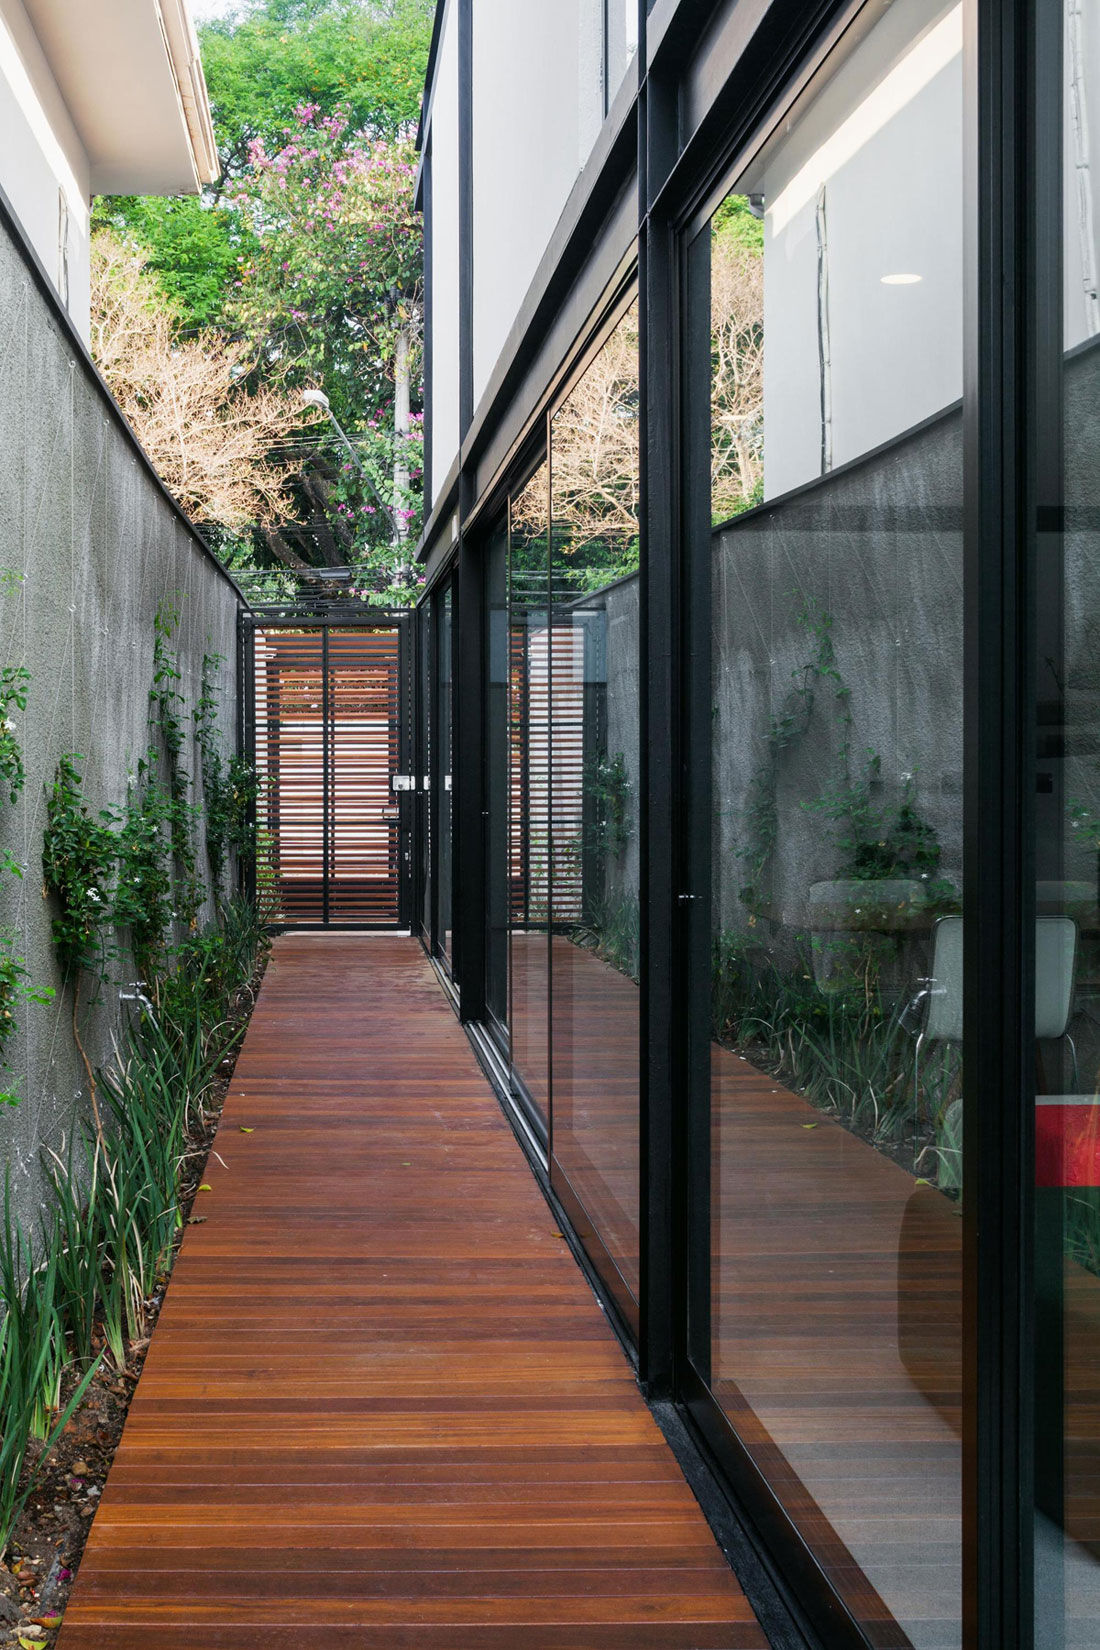 Dise o de casa larga y angosta con planos y fachada inlcuida for Diseno de casas angostas